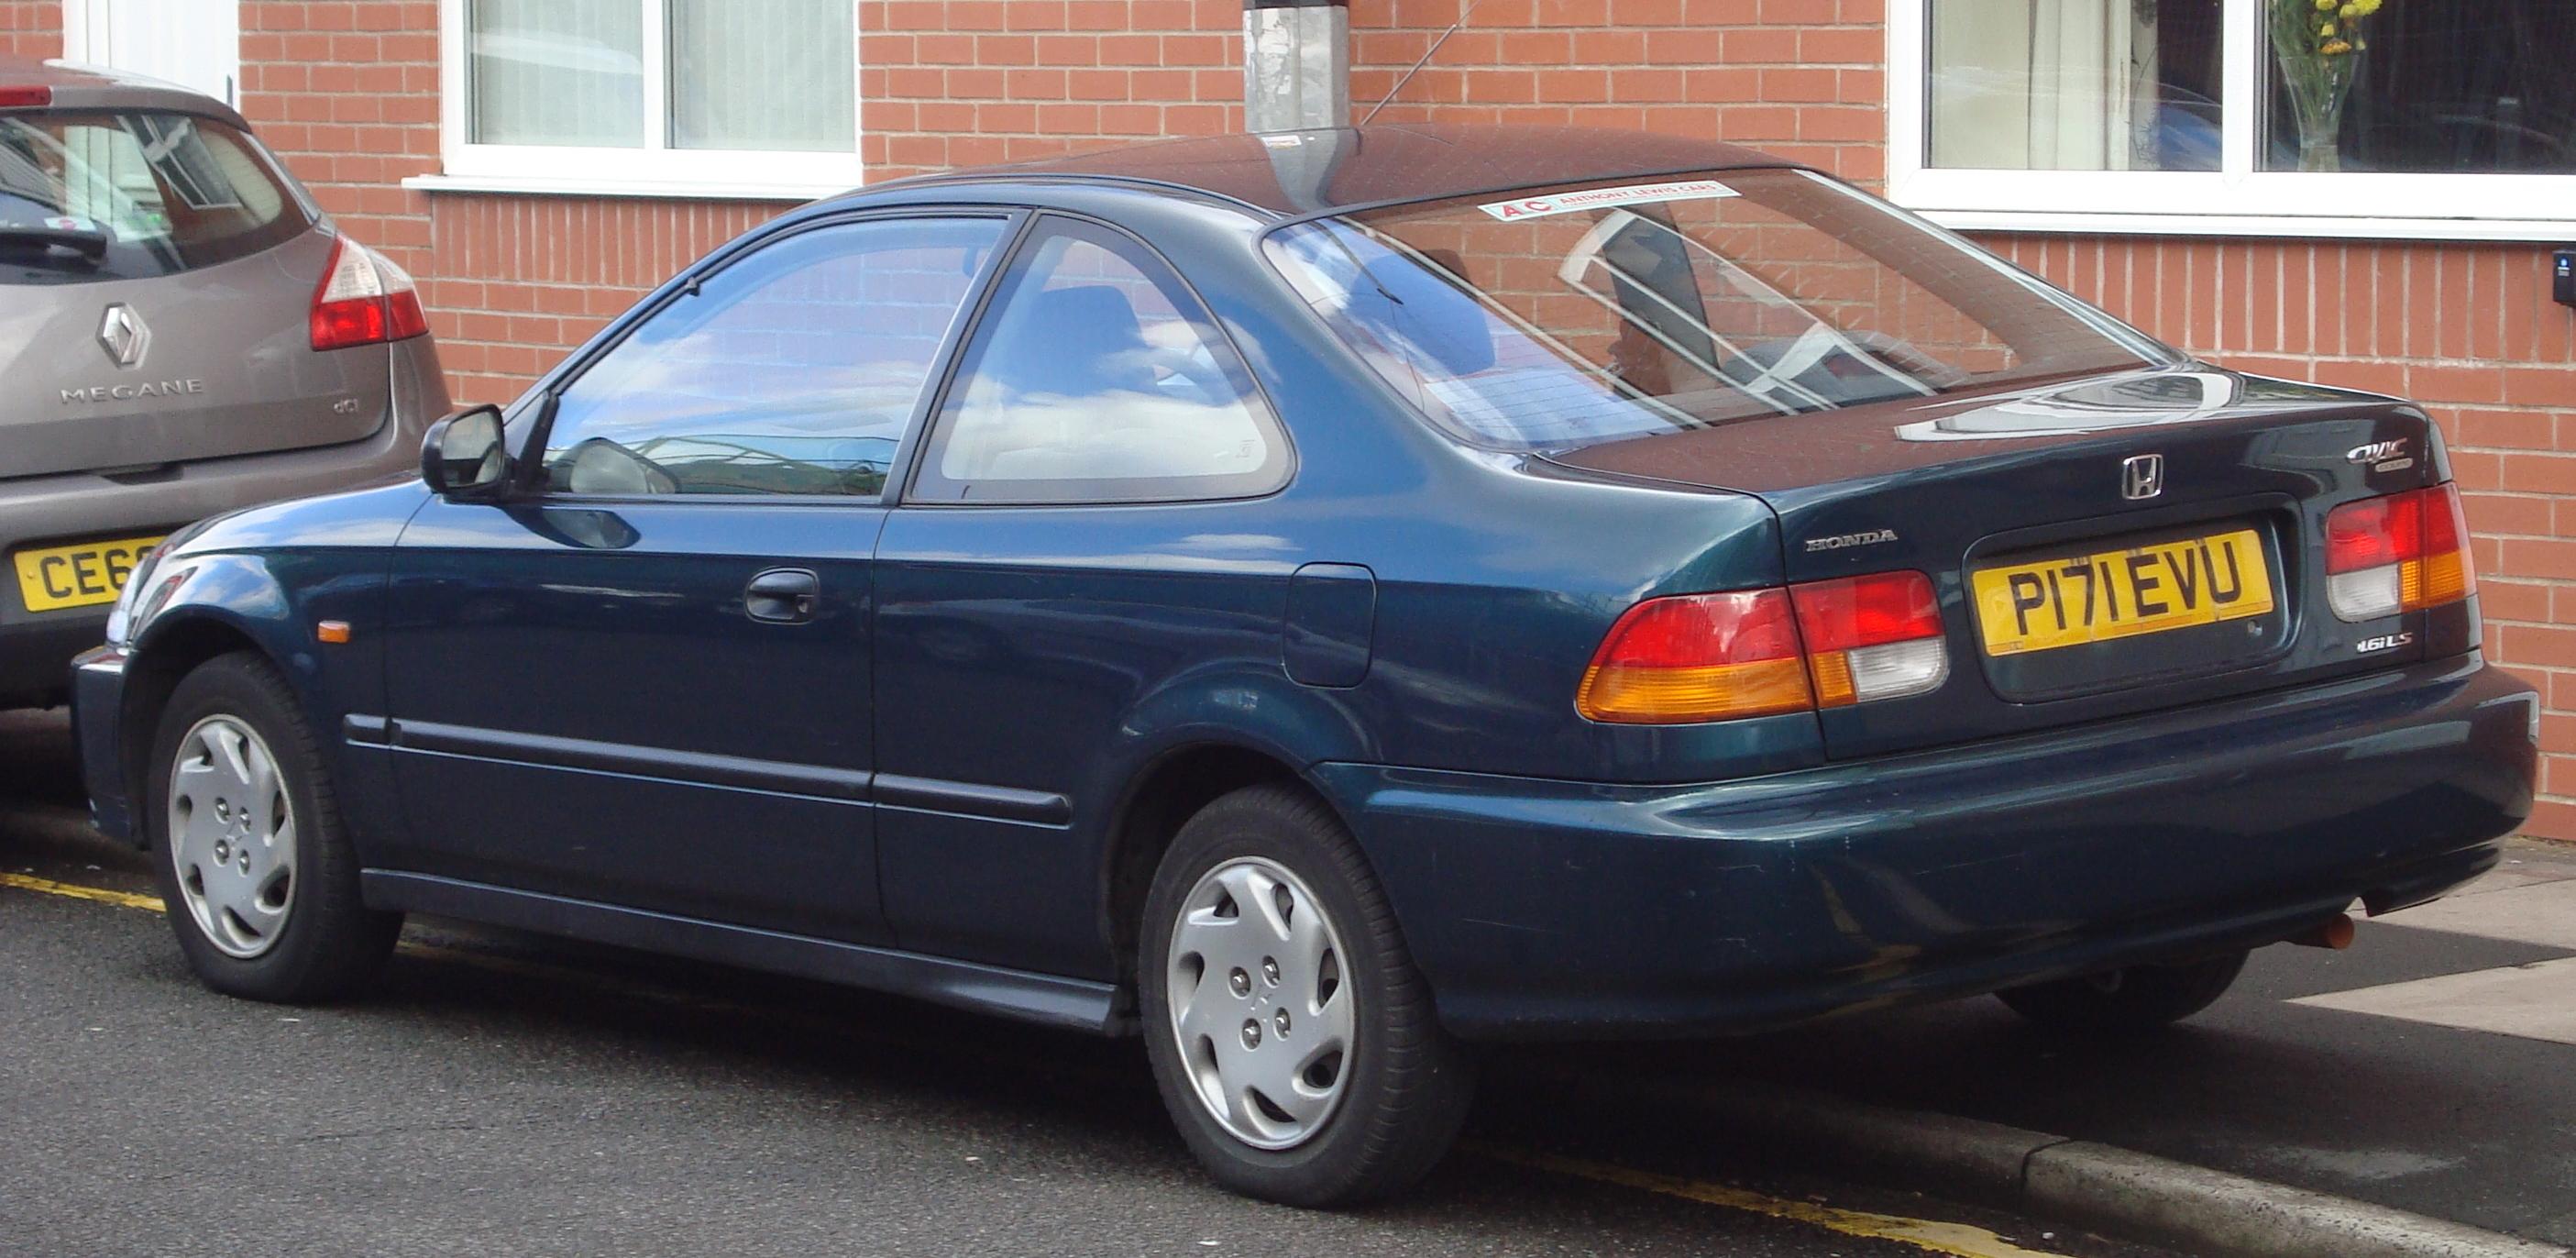 Kelebihan Civic 1996 Top Model Tahun Ini